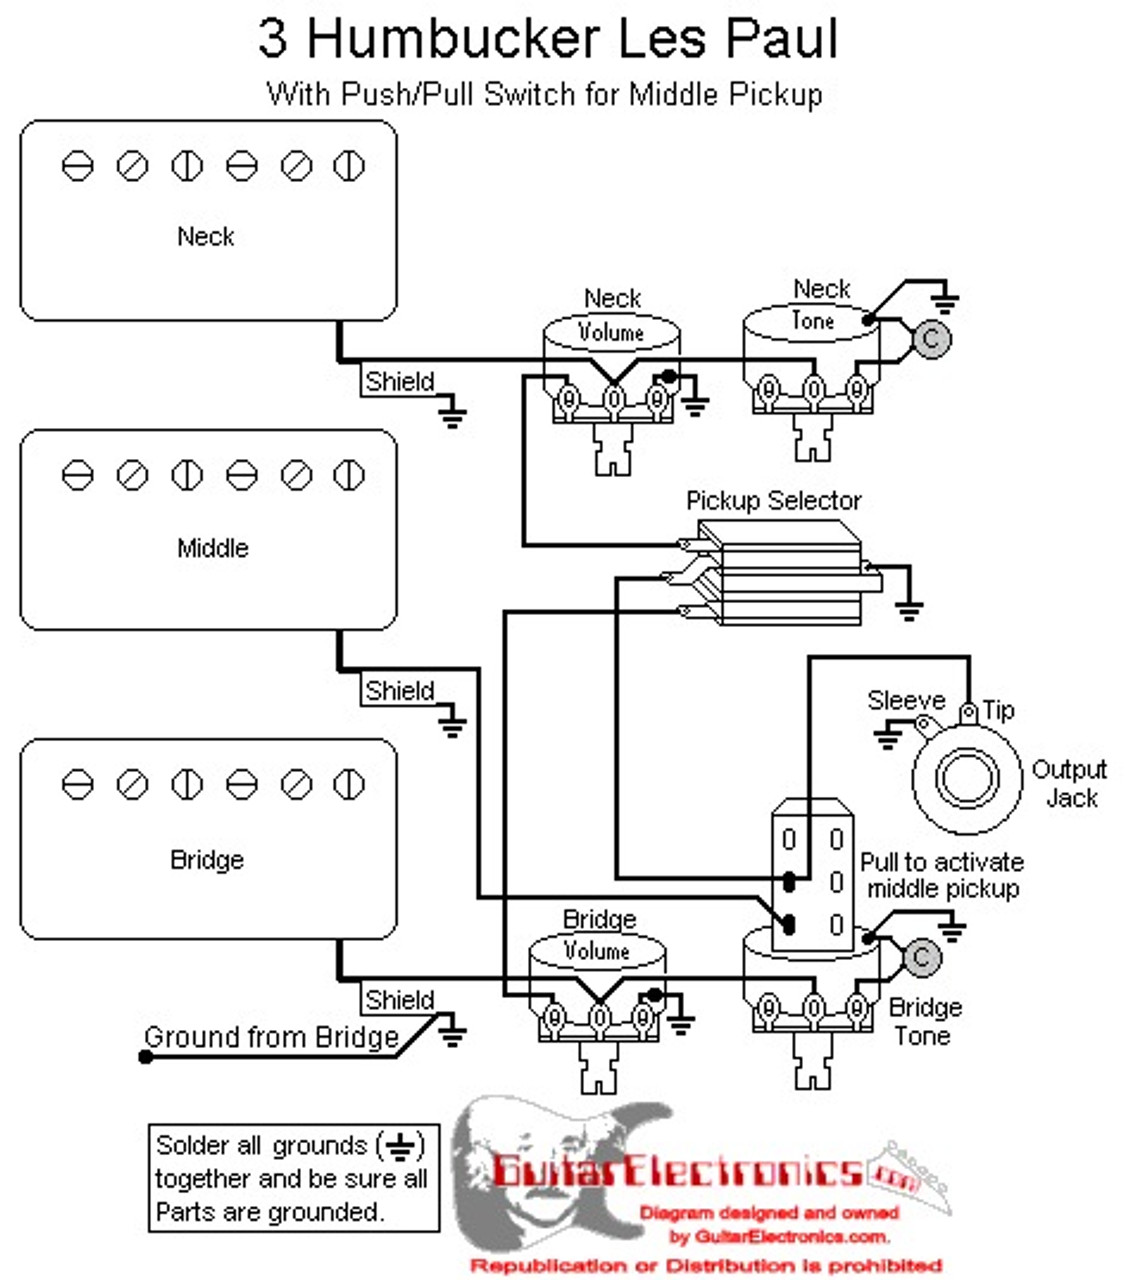 small resolution of wdu hhh3t22 02 3 pickups wiring diagram 3 humbucker wiring diagram